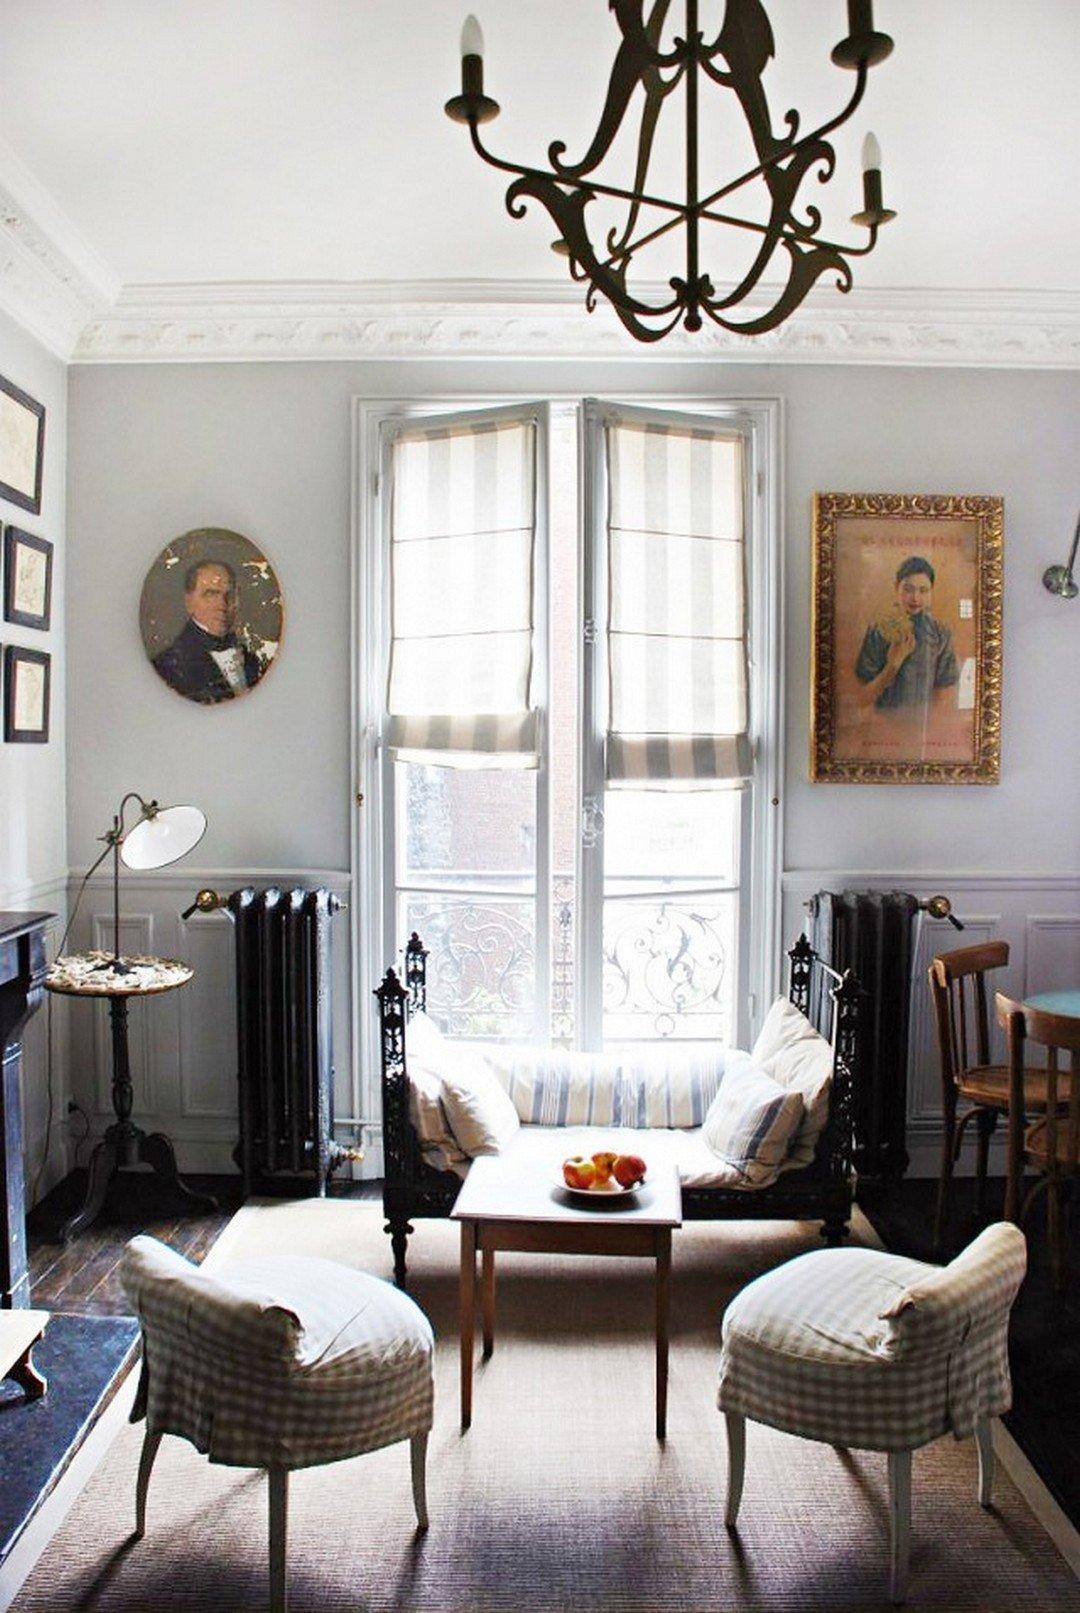 Paris themed Living Room Decor Beautiful 29 Luxurious Parisian Style Home Decor the Master Of Harmonious Living Goodnewsarchitecture